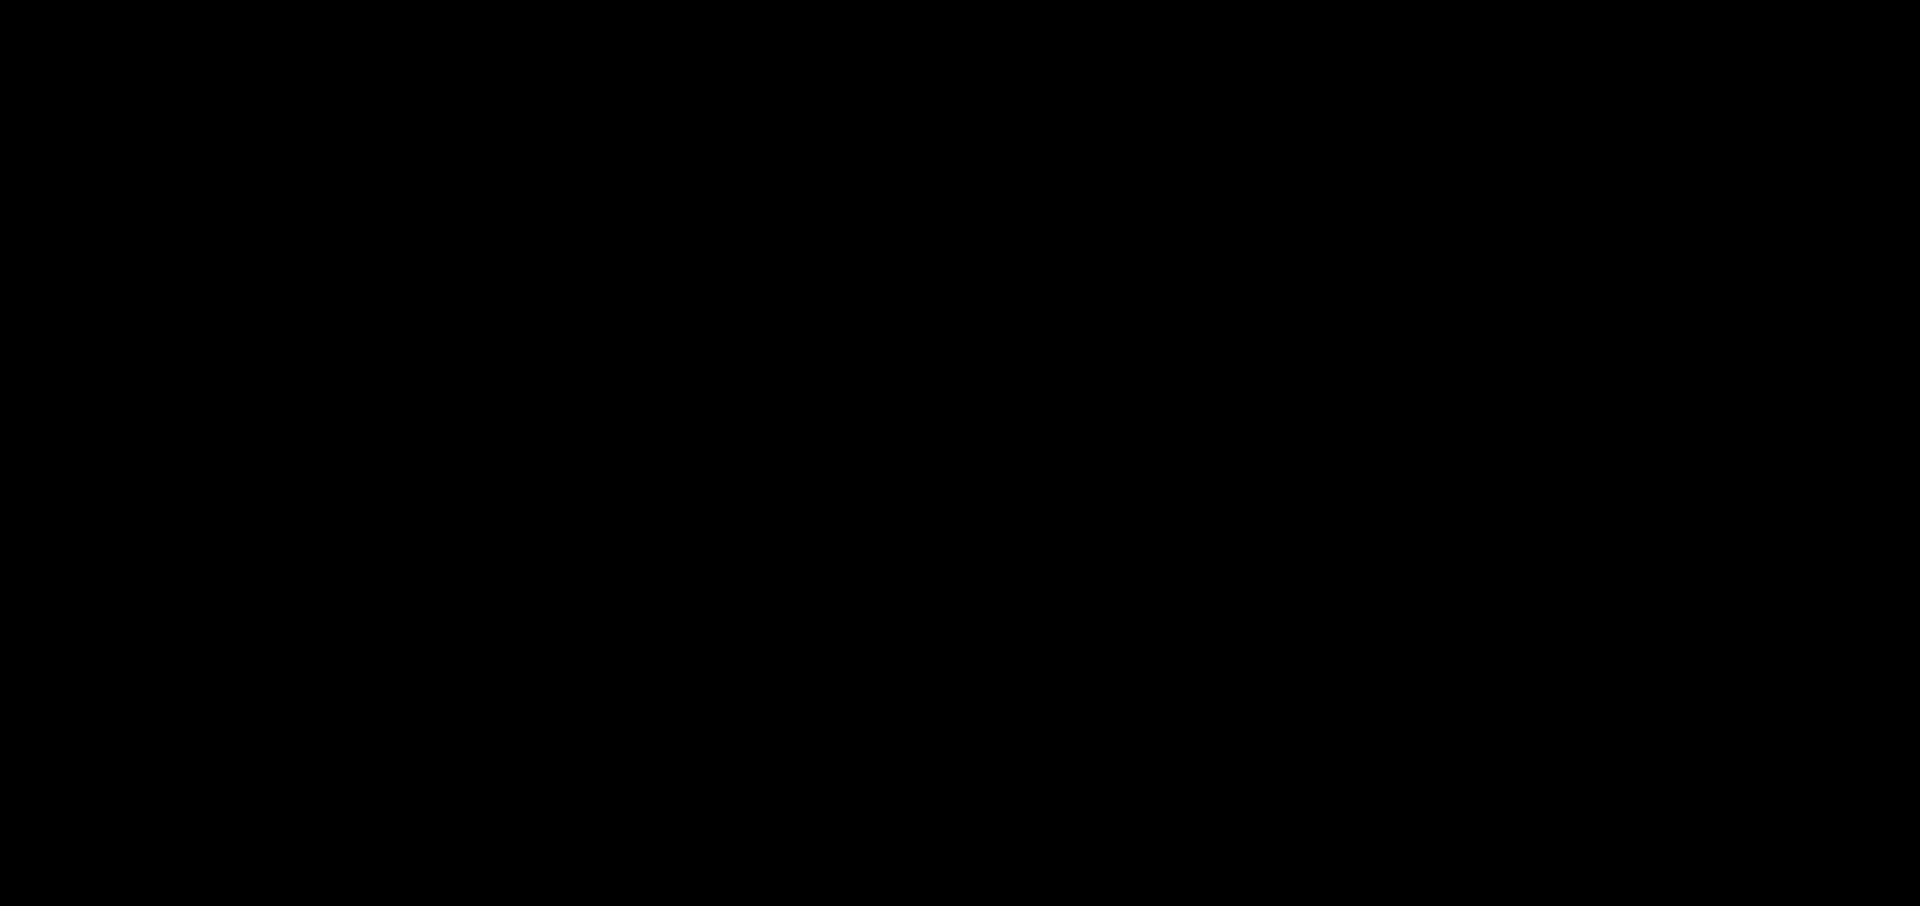 caract